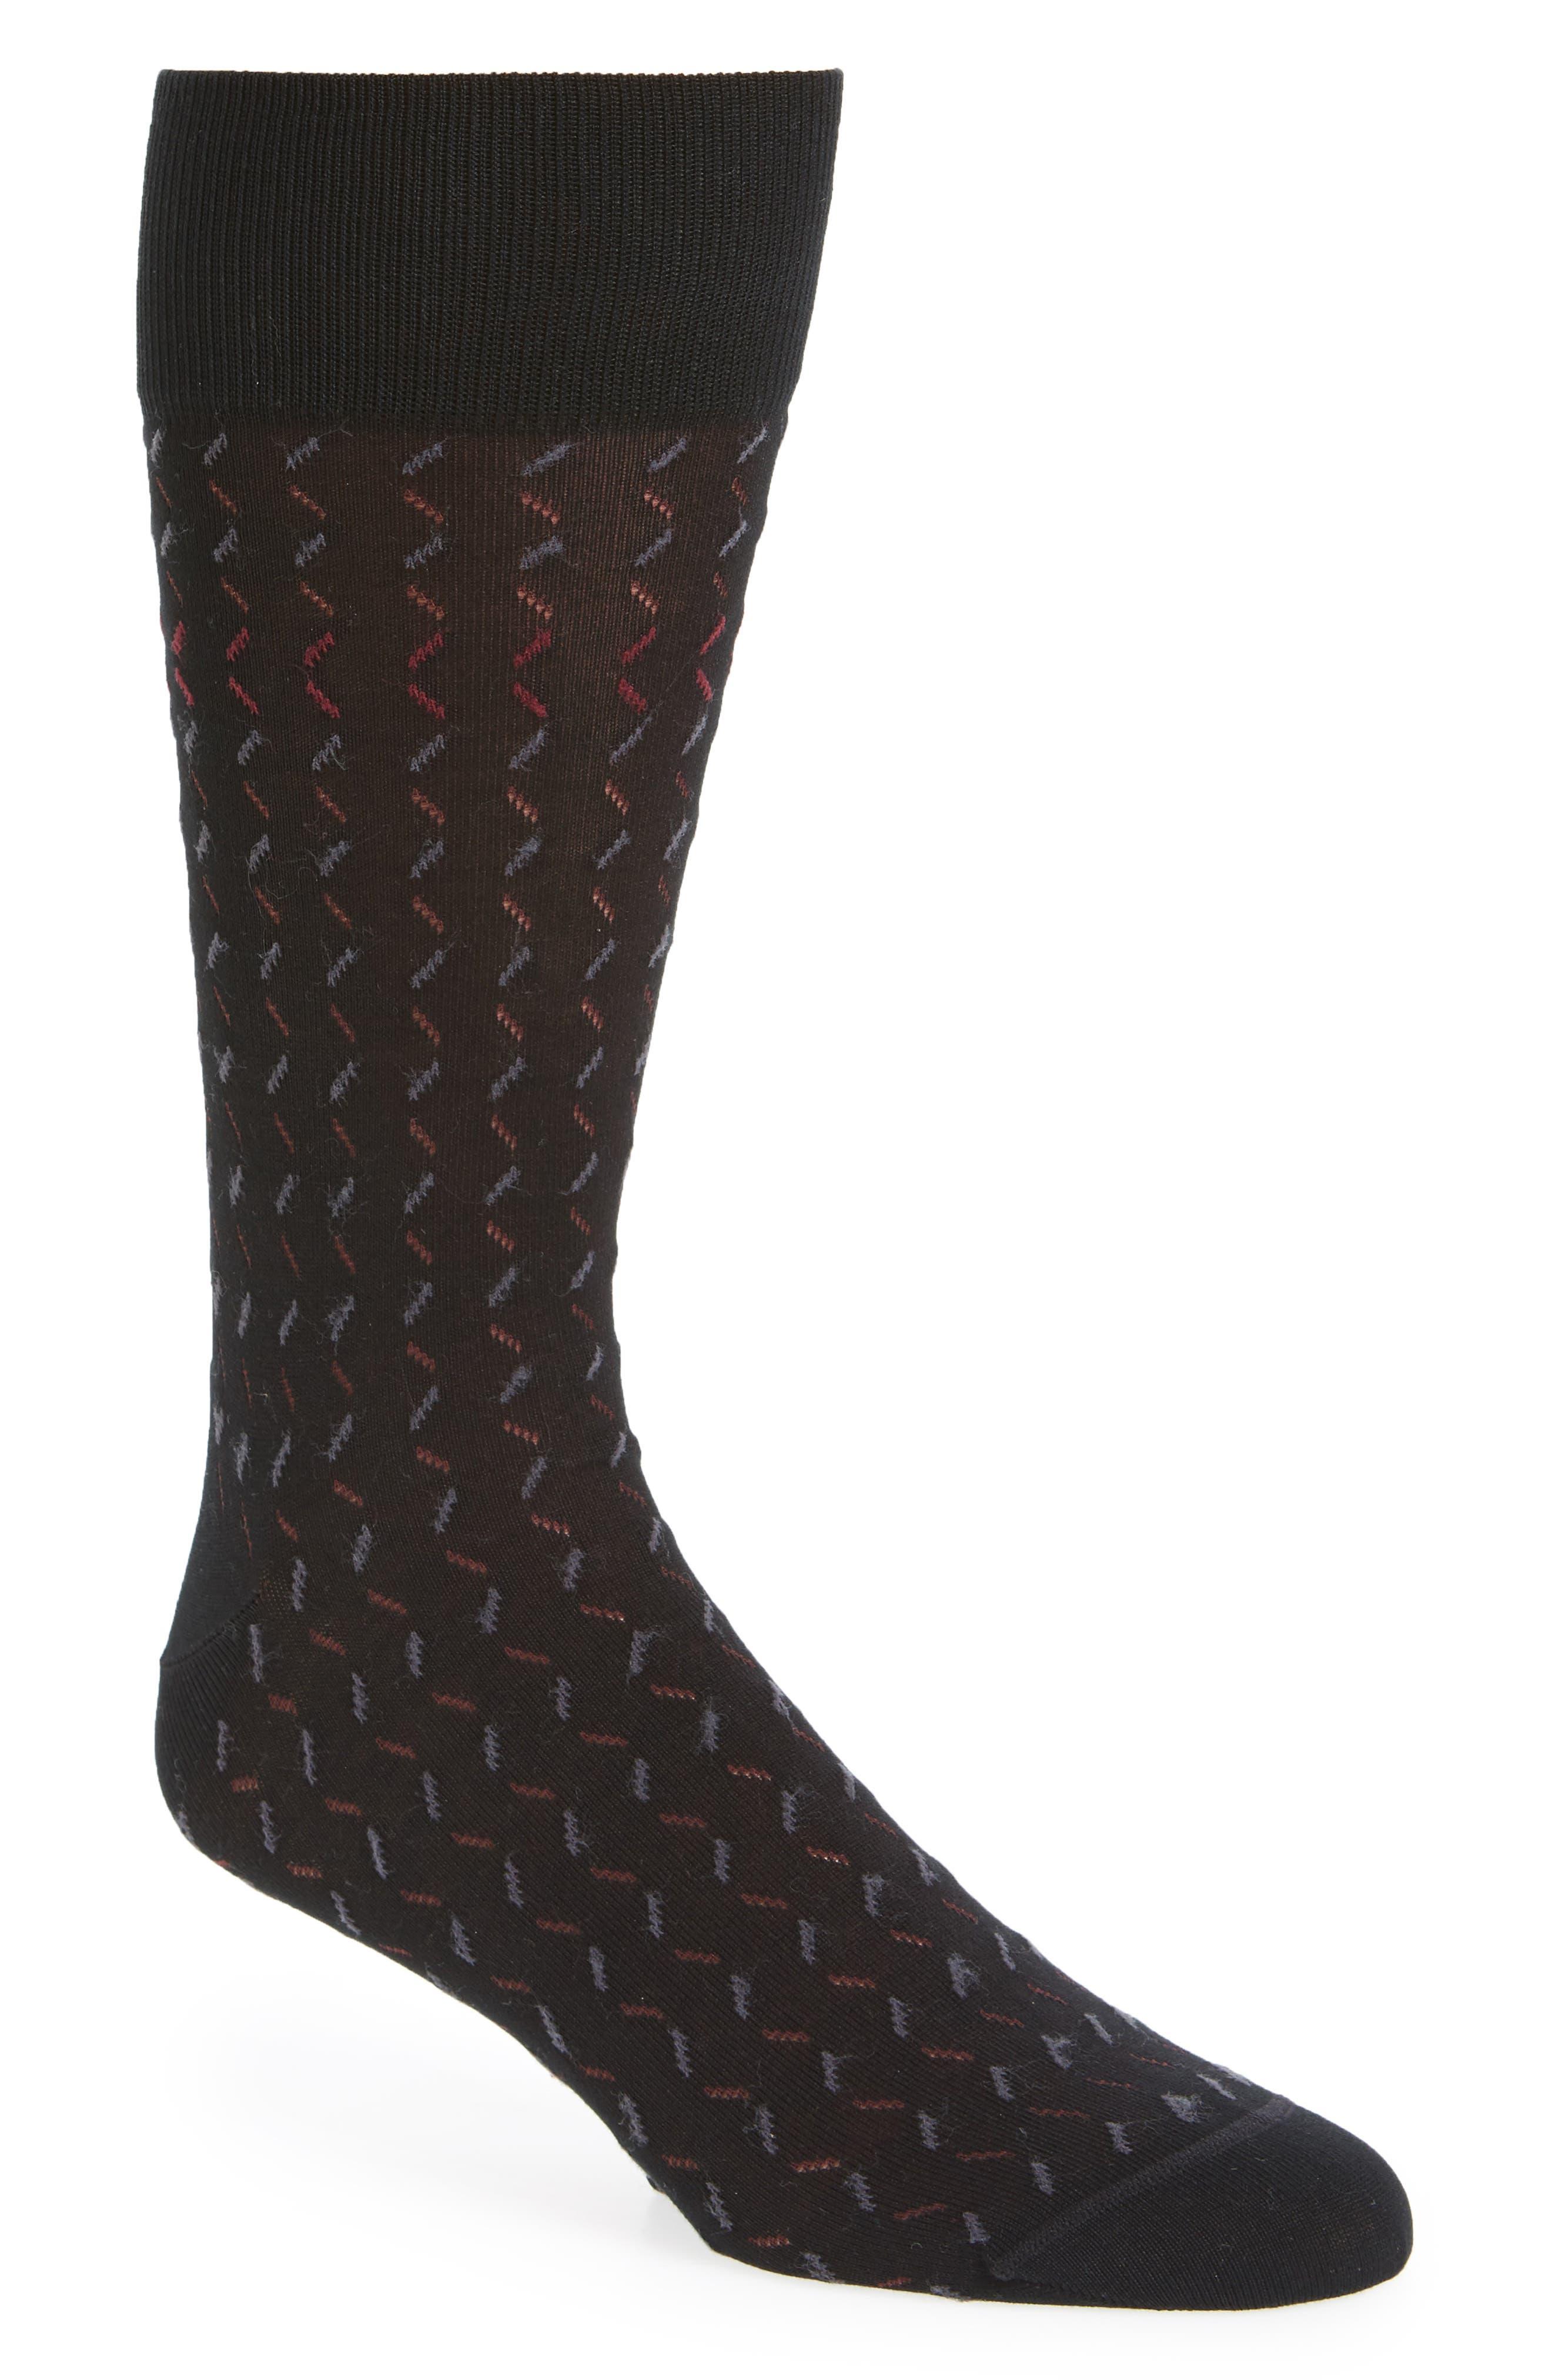 Dash Socks,                             Main thumbnail 1, color,                             001